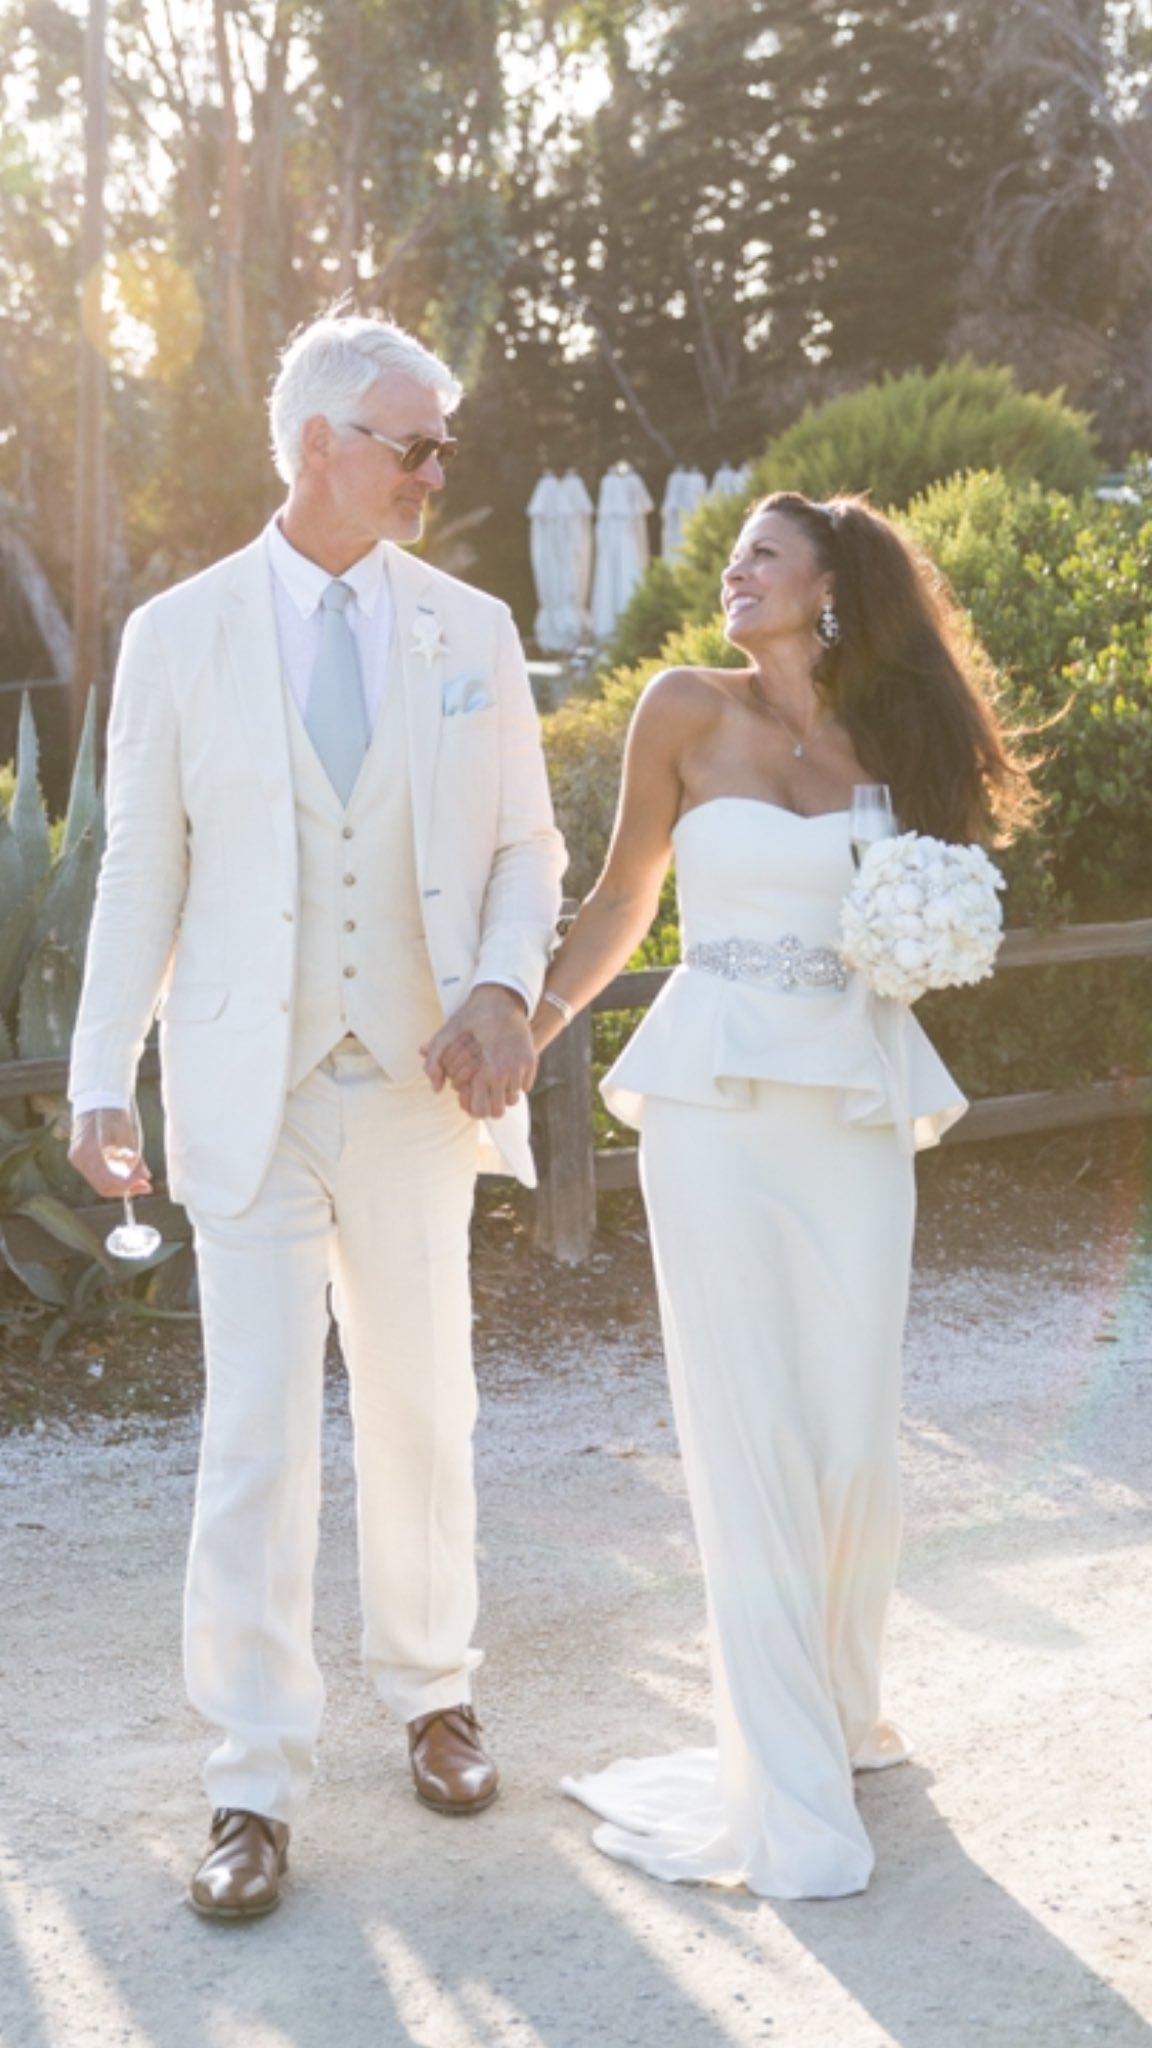 Clint Watts Wedding.Clint Eastwood S Ex Wife Dina Marries Scott Fisher After Post Split